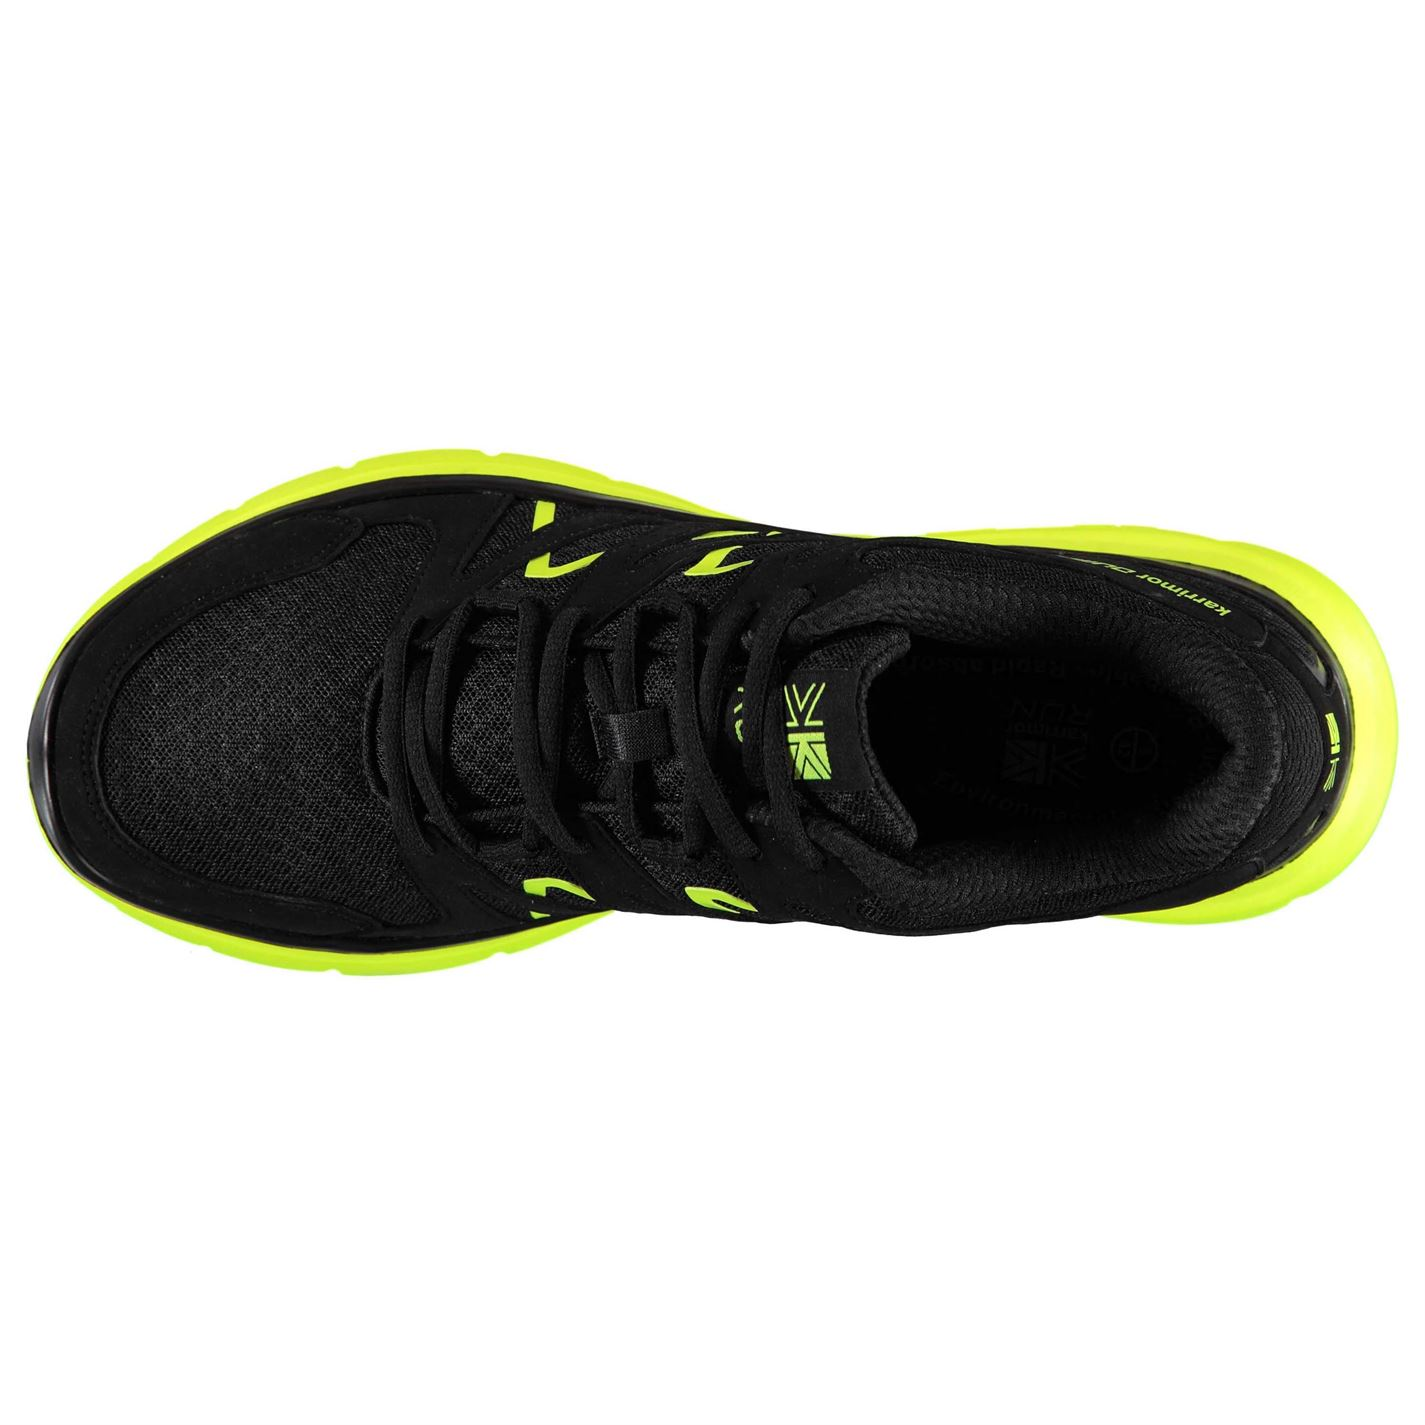 Karrimor-Mens-Duma-Trainers-Lace-Up-Sports-Running-Cross-Training-Shoes thumbnail 30